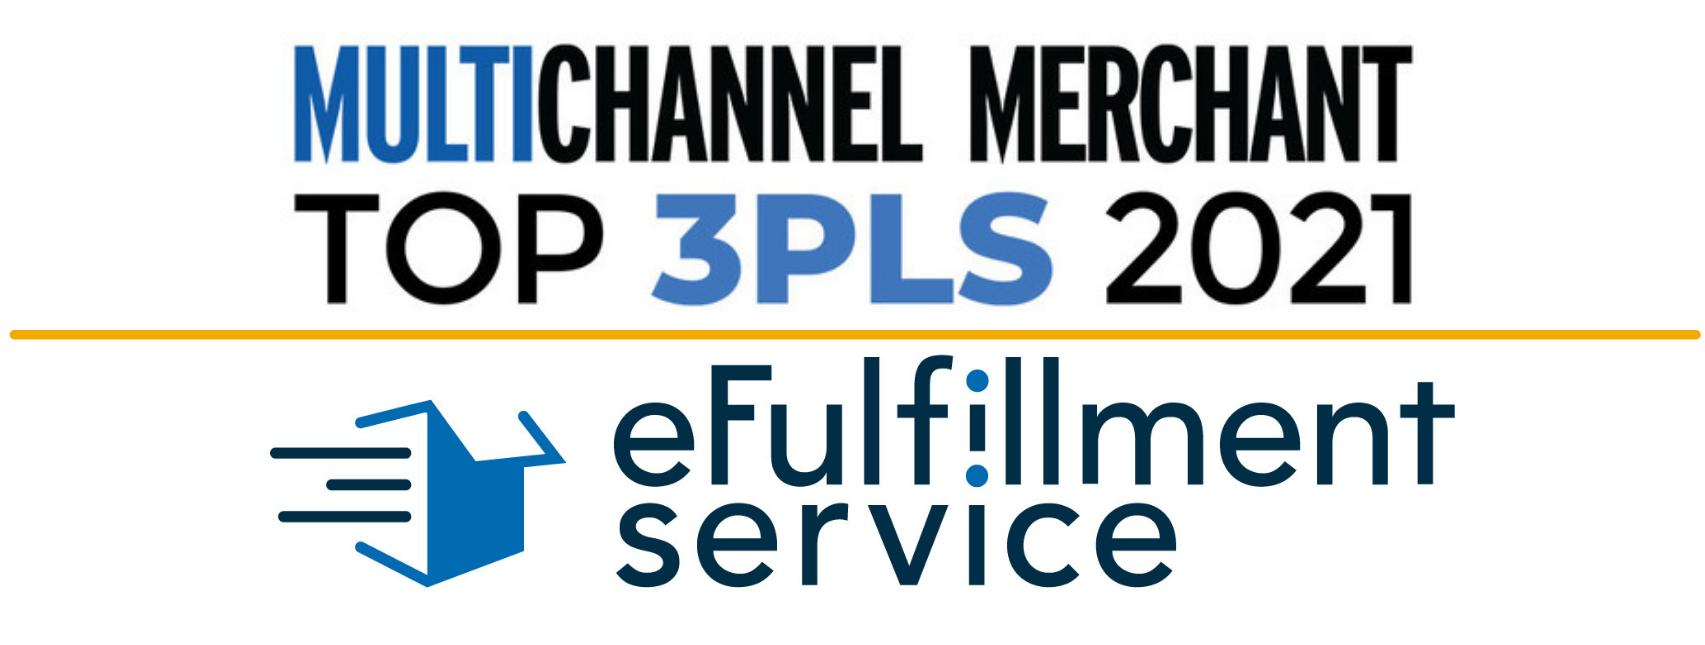 eFulfillment Service Named a MCM Top 3PL for 2021